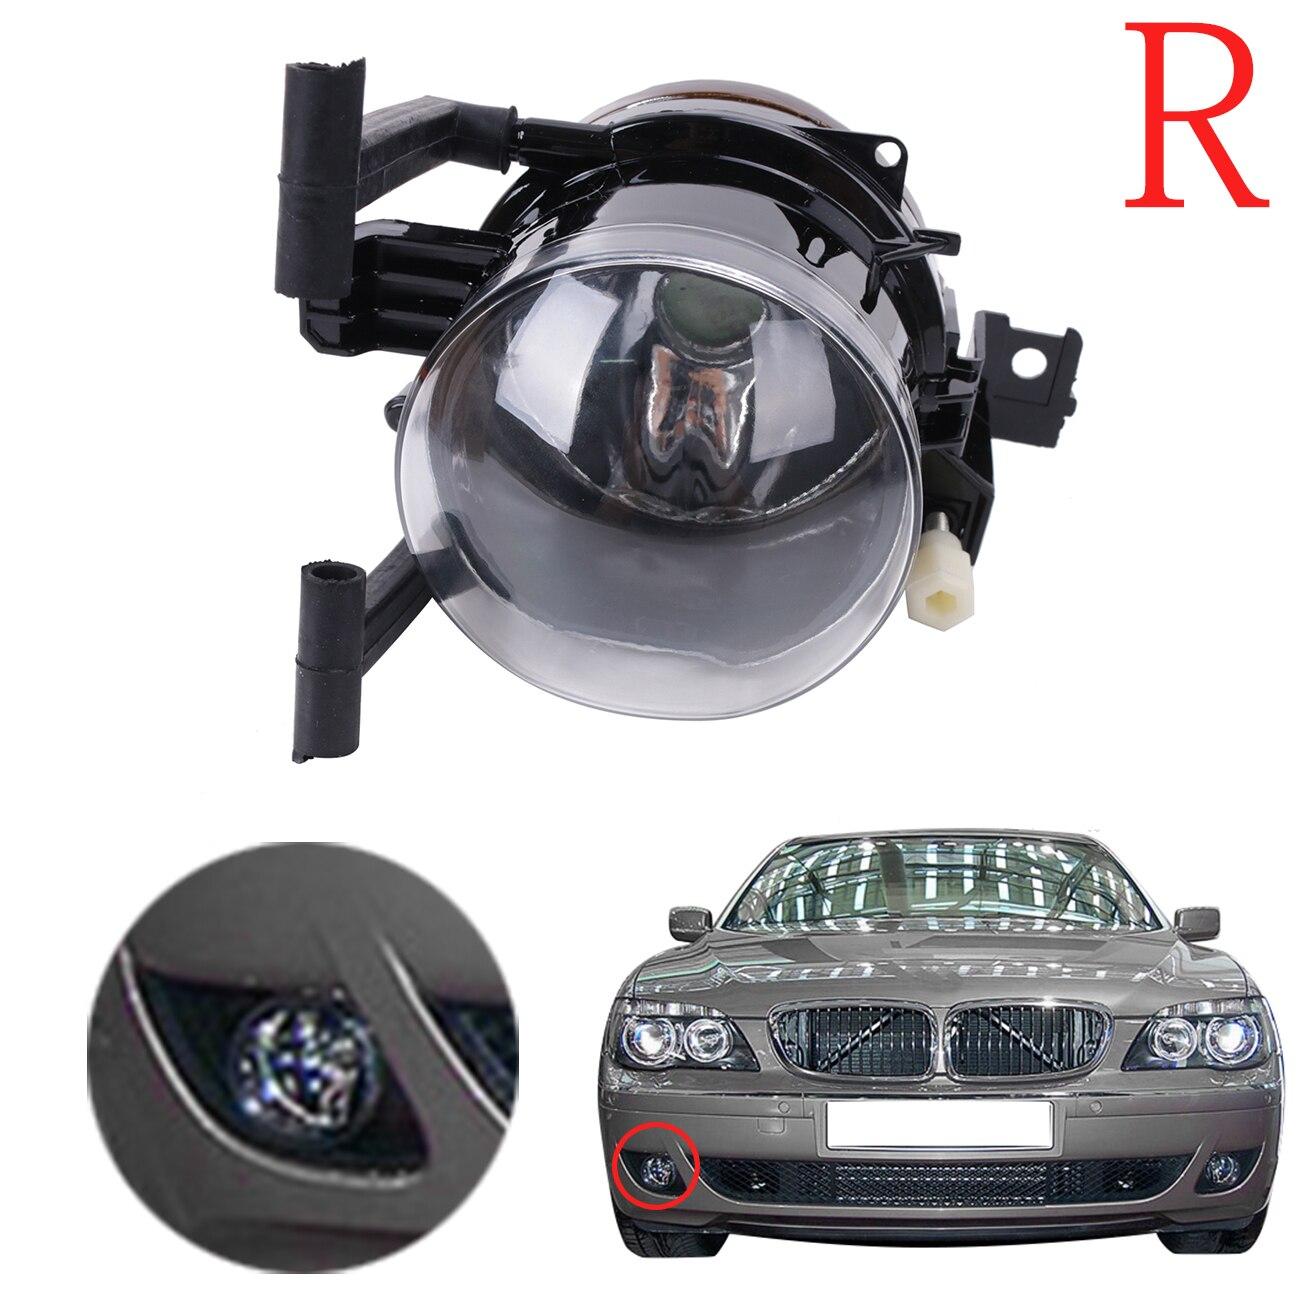 Auto Front Bumper Driving Fog Light Lamp For BMW E65 E66 Facelift 7 Series 745i 750i 760i / Li 2005 - 2008 Right Side #W082-R